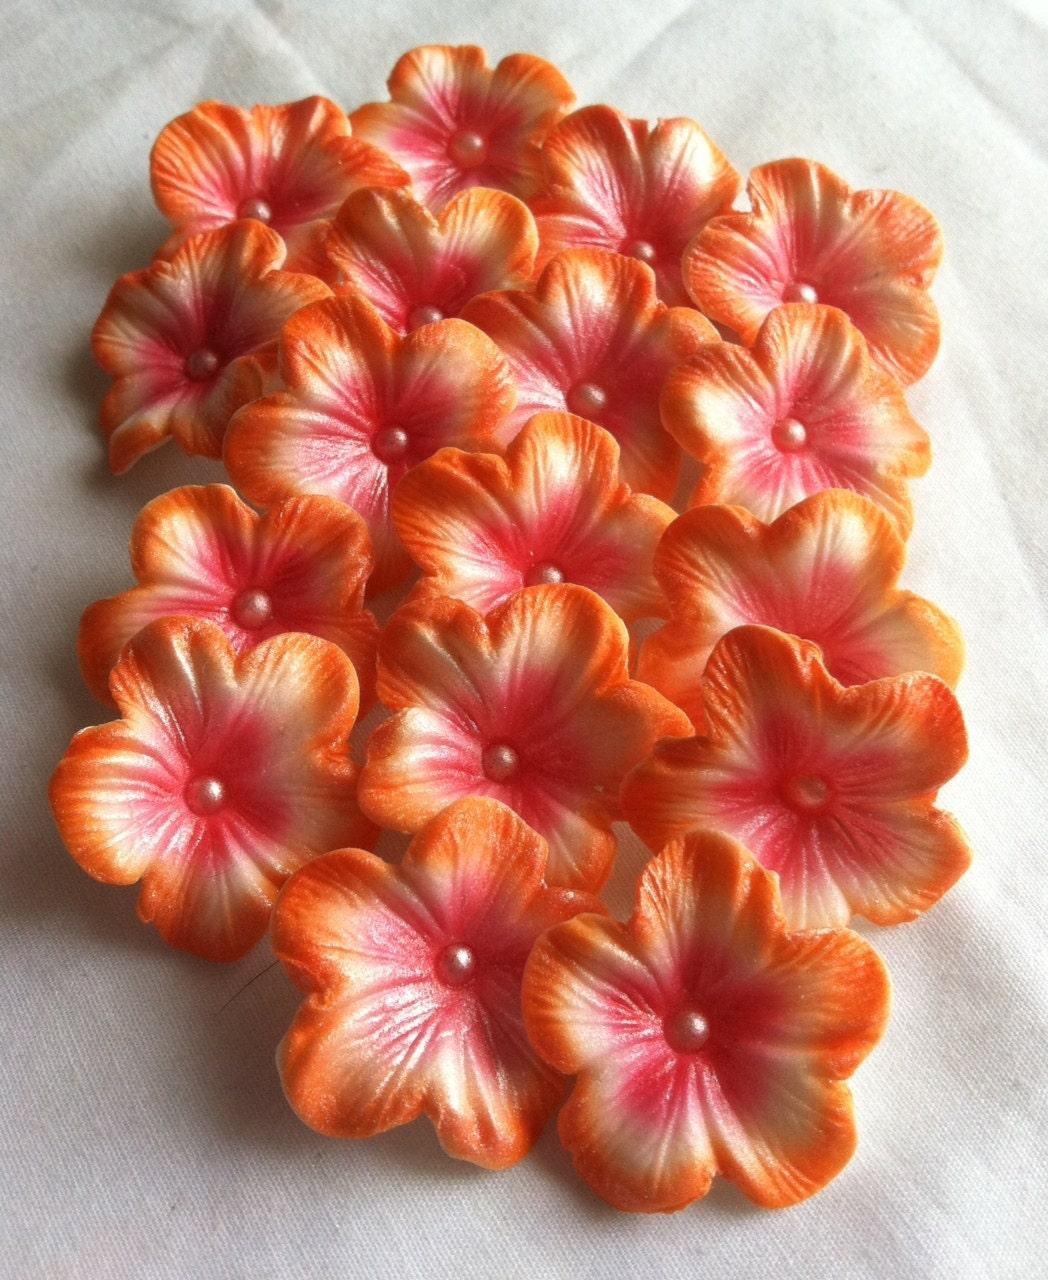 Gumpaste cake decorations sugar flowers edible wedding cake topper gumpaste cake decorations sugar flowers edible wedding cake topper gum paste izmirmasajfo Gallery